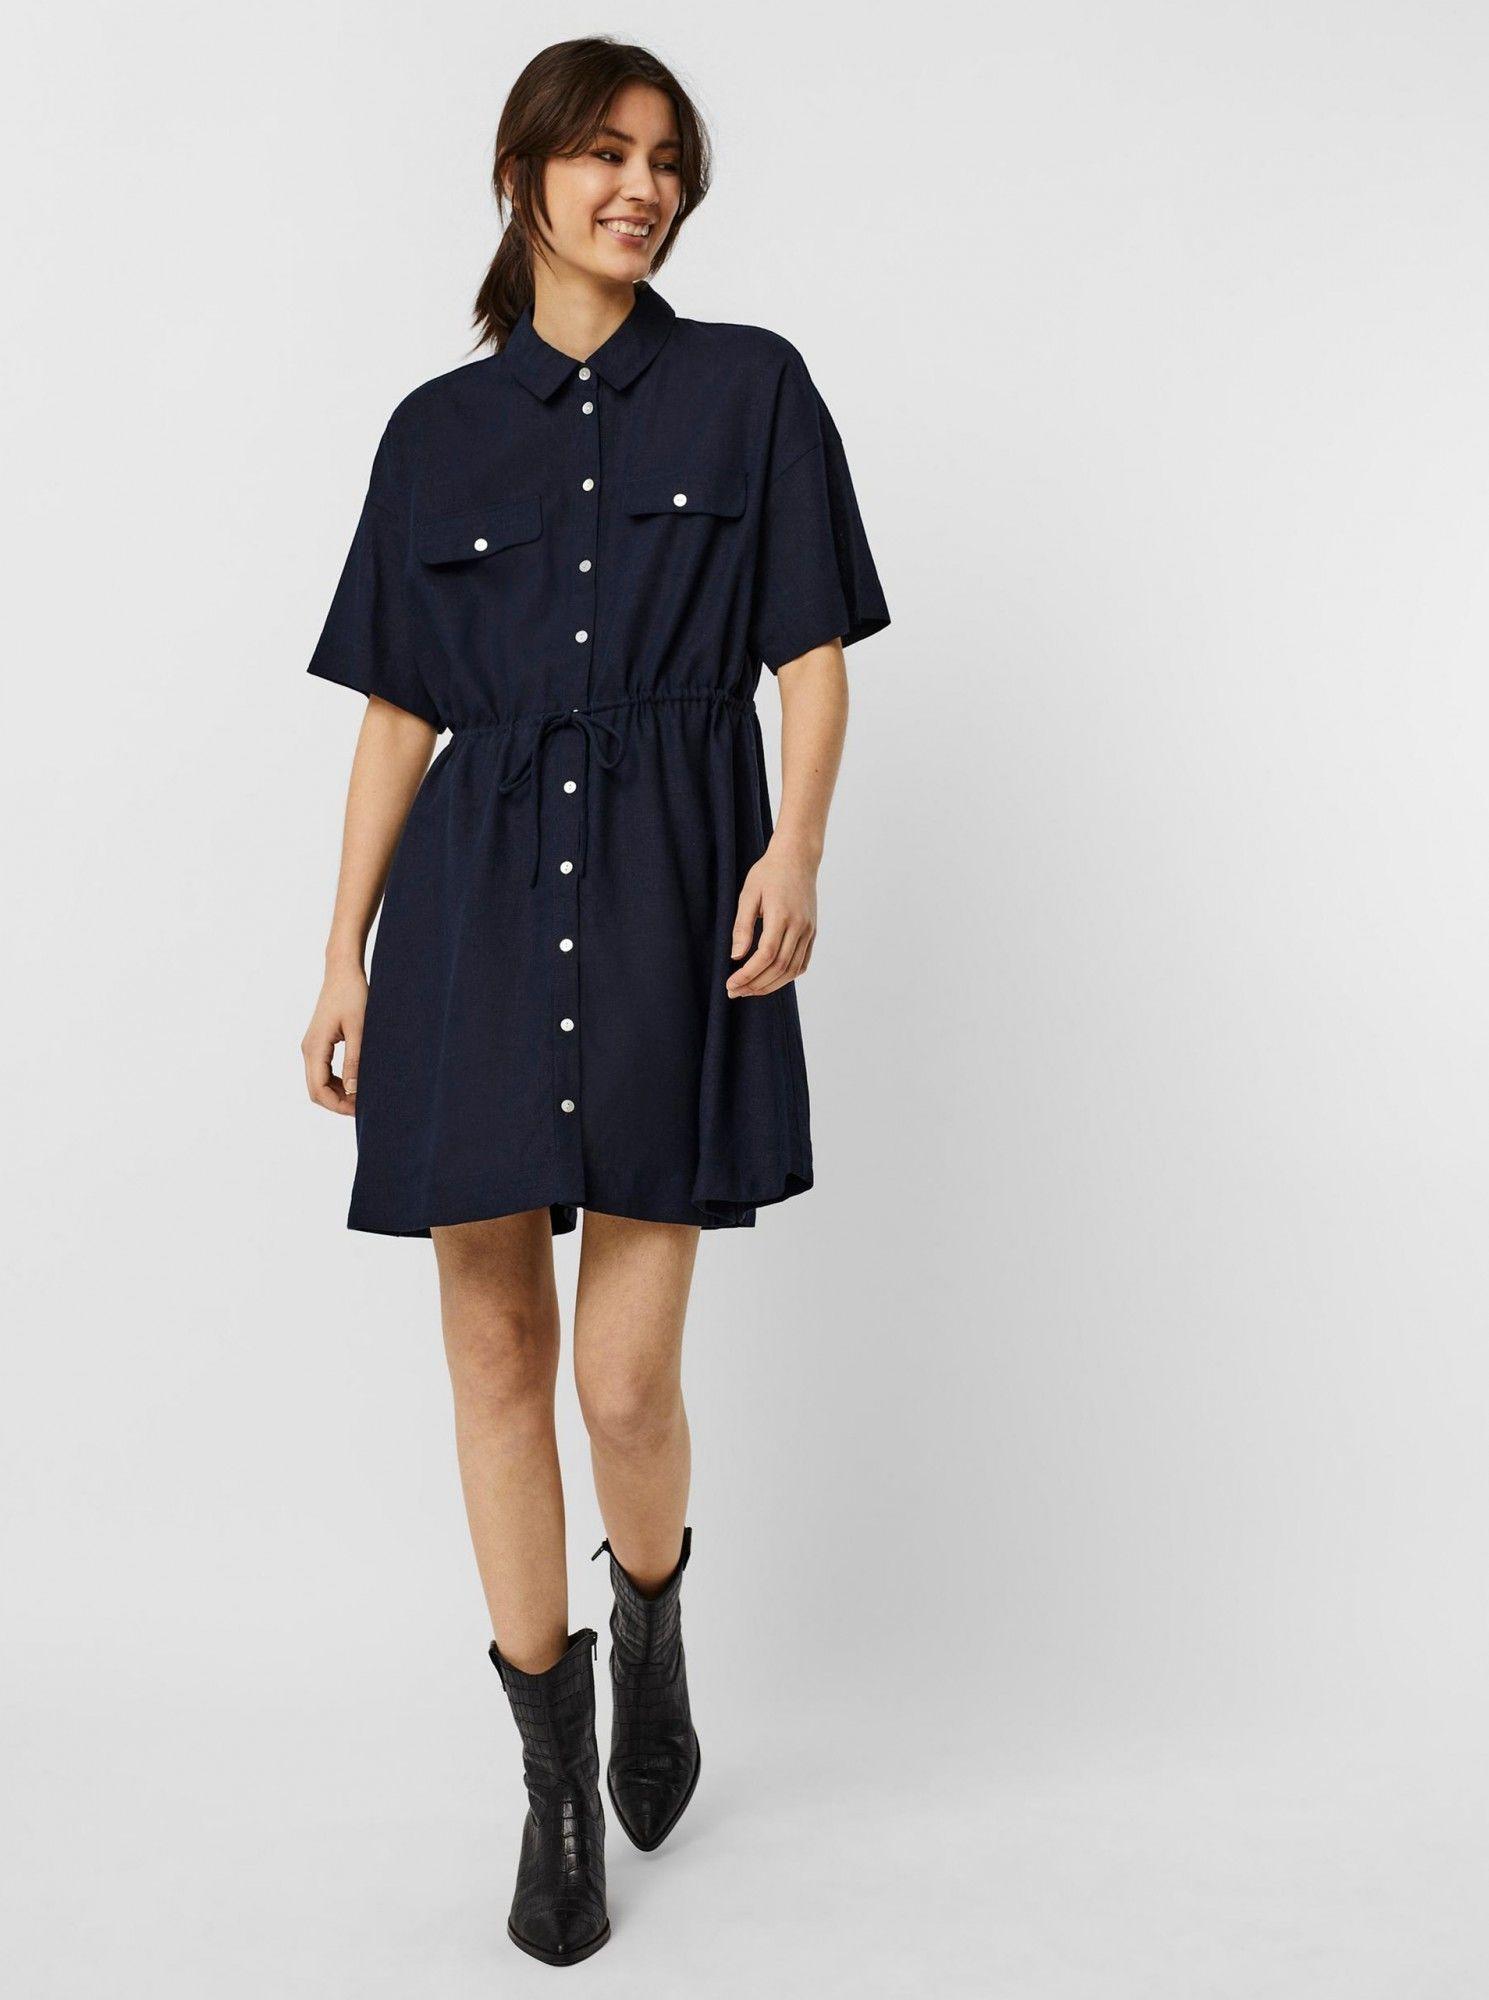 Vero Moda niebieski koszulowa sukienka Haf